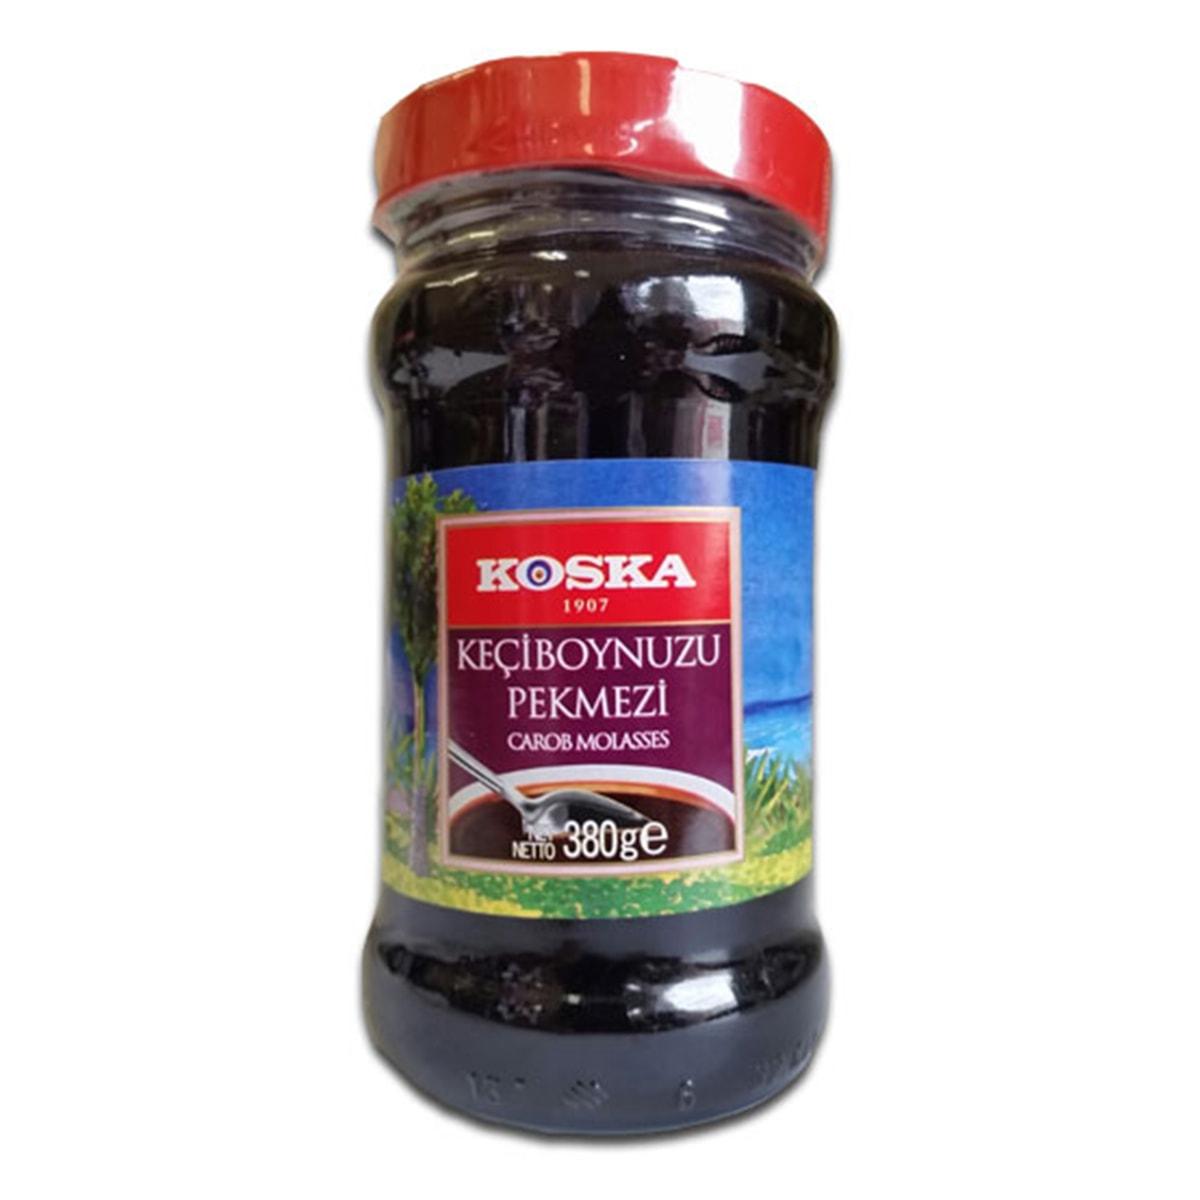 Buy Koska Carob Molasses (Keciboynuzu Pekmezi) - 380 gm